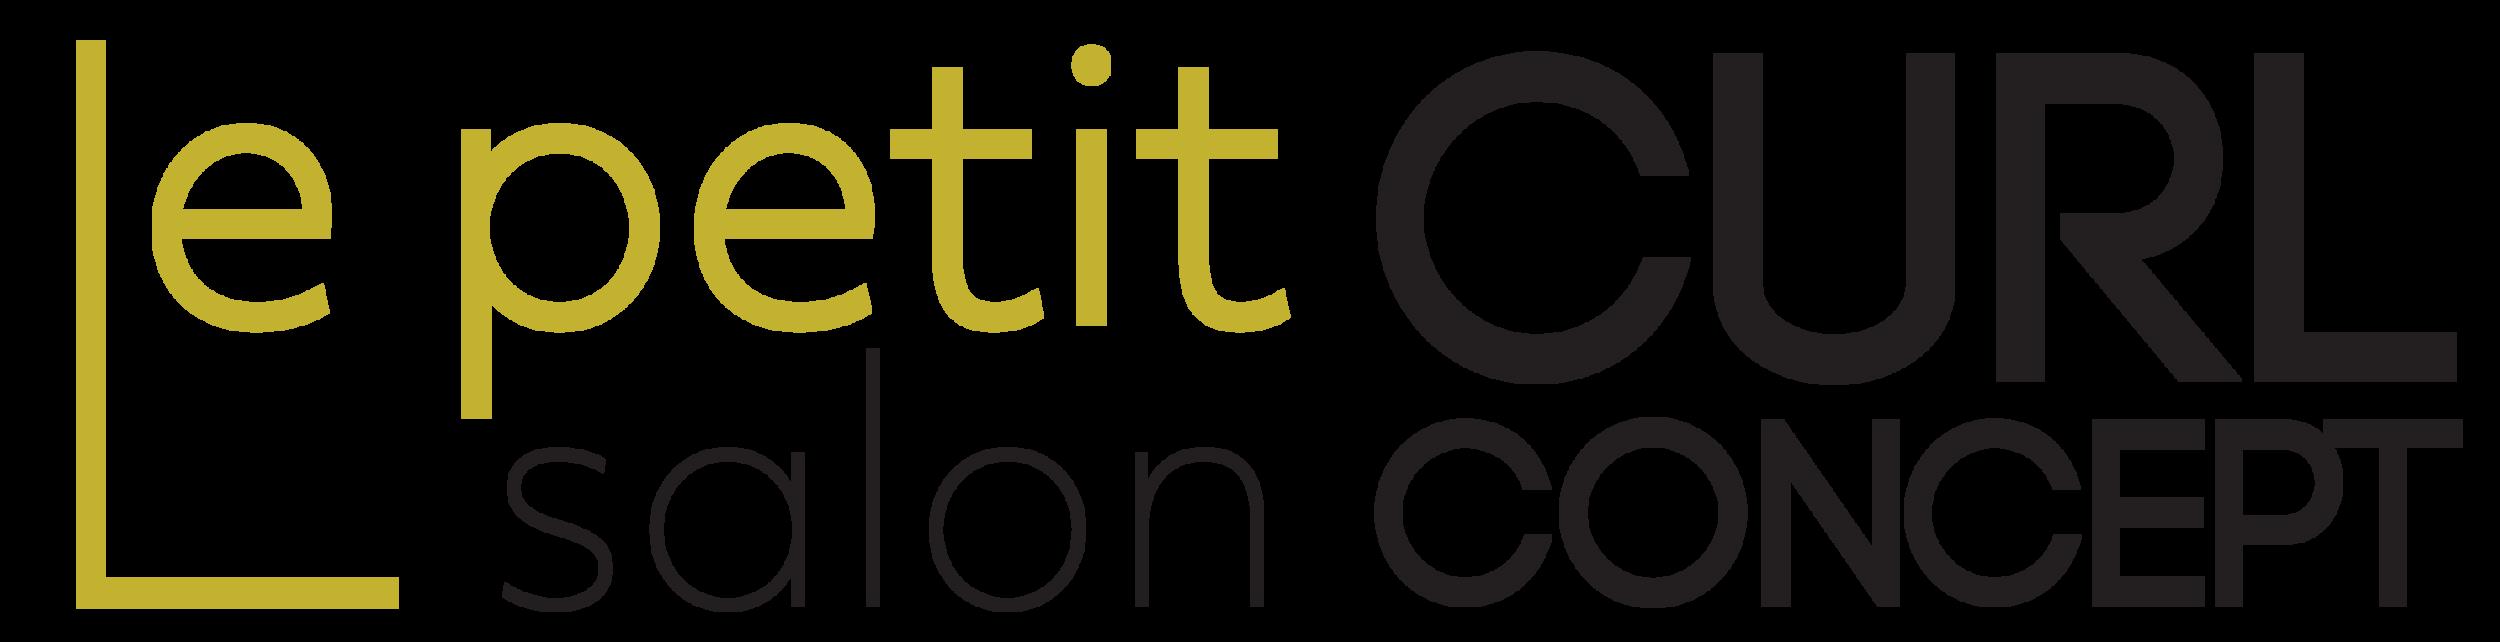 lepetitsalon_color logo.png